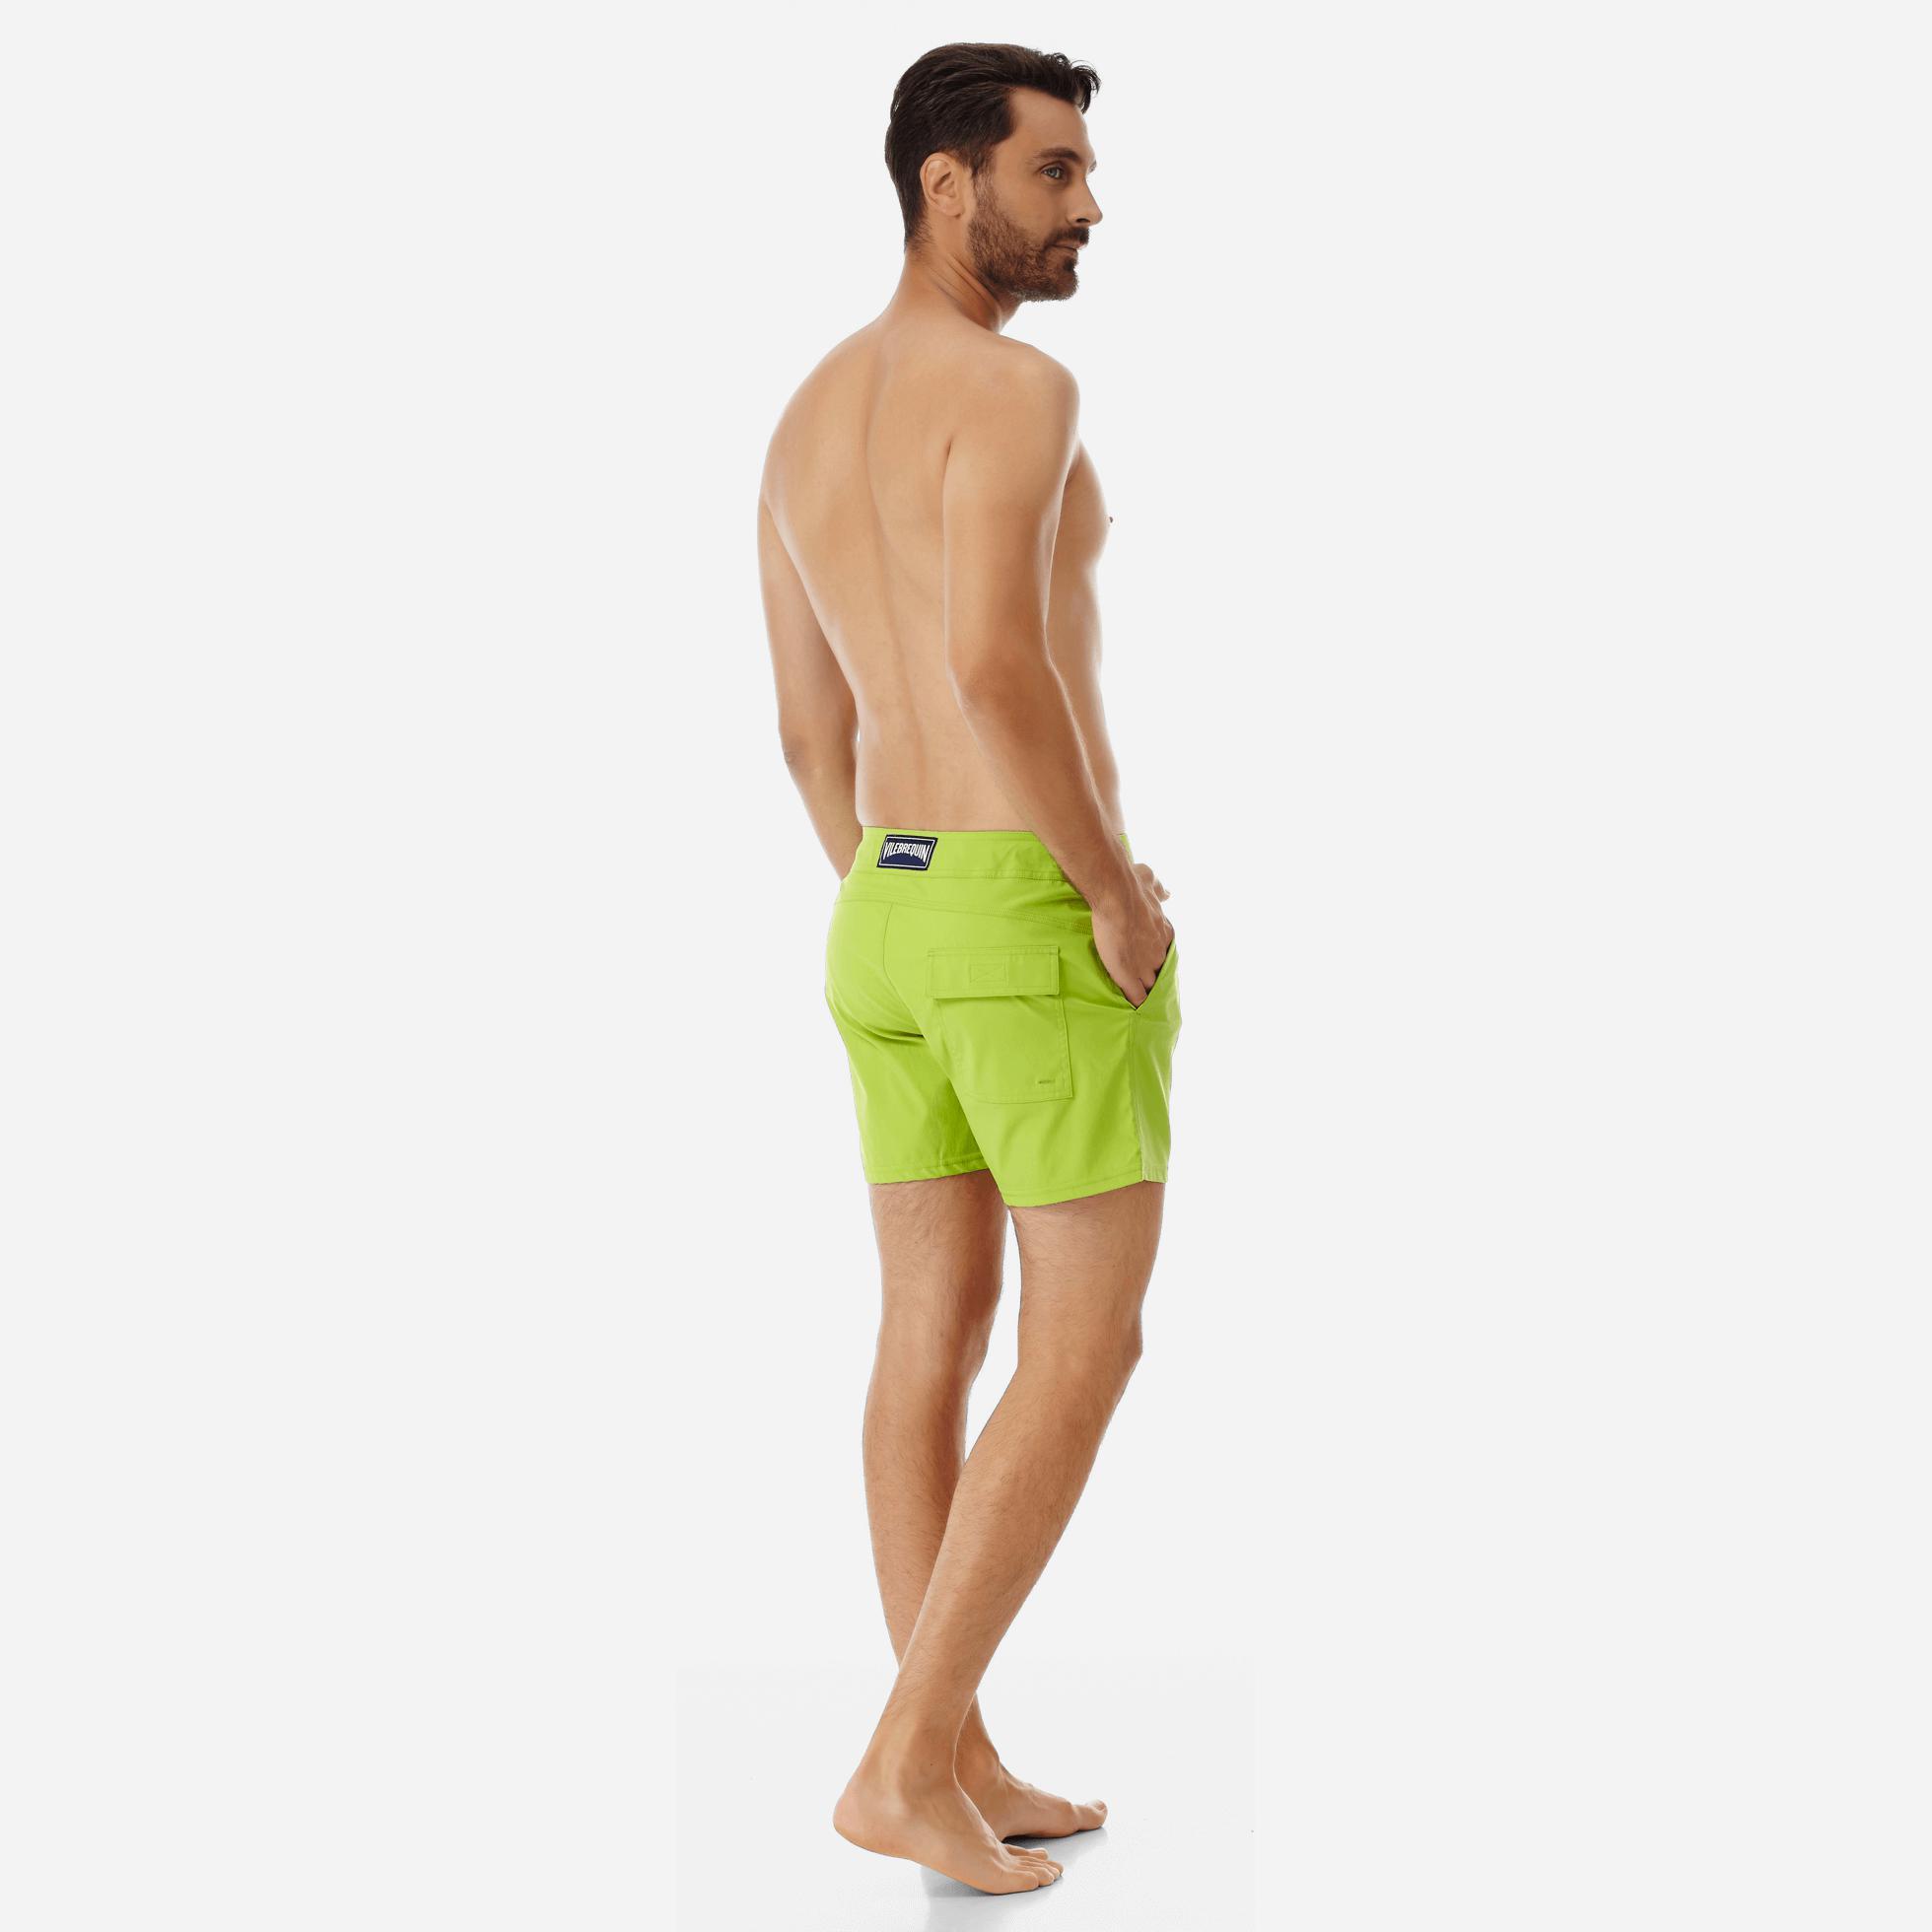 586b0a6300 Vilebrequin - Green Men Flat Belt Stretch Swimwear Solid for Men - Lyst.  View fullscreen